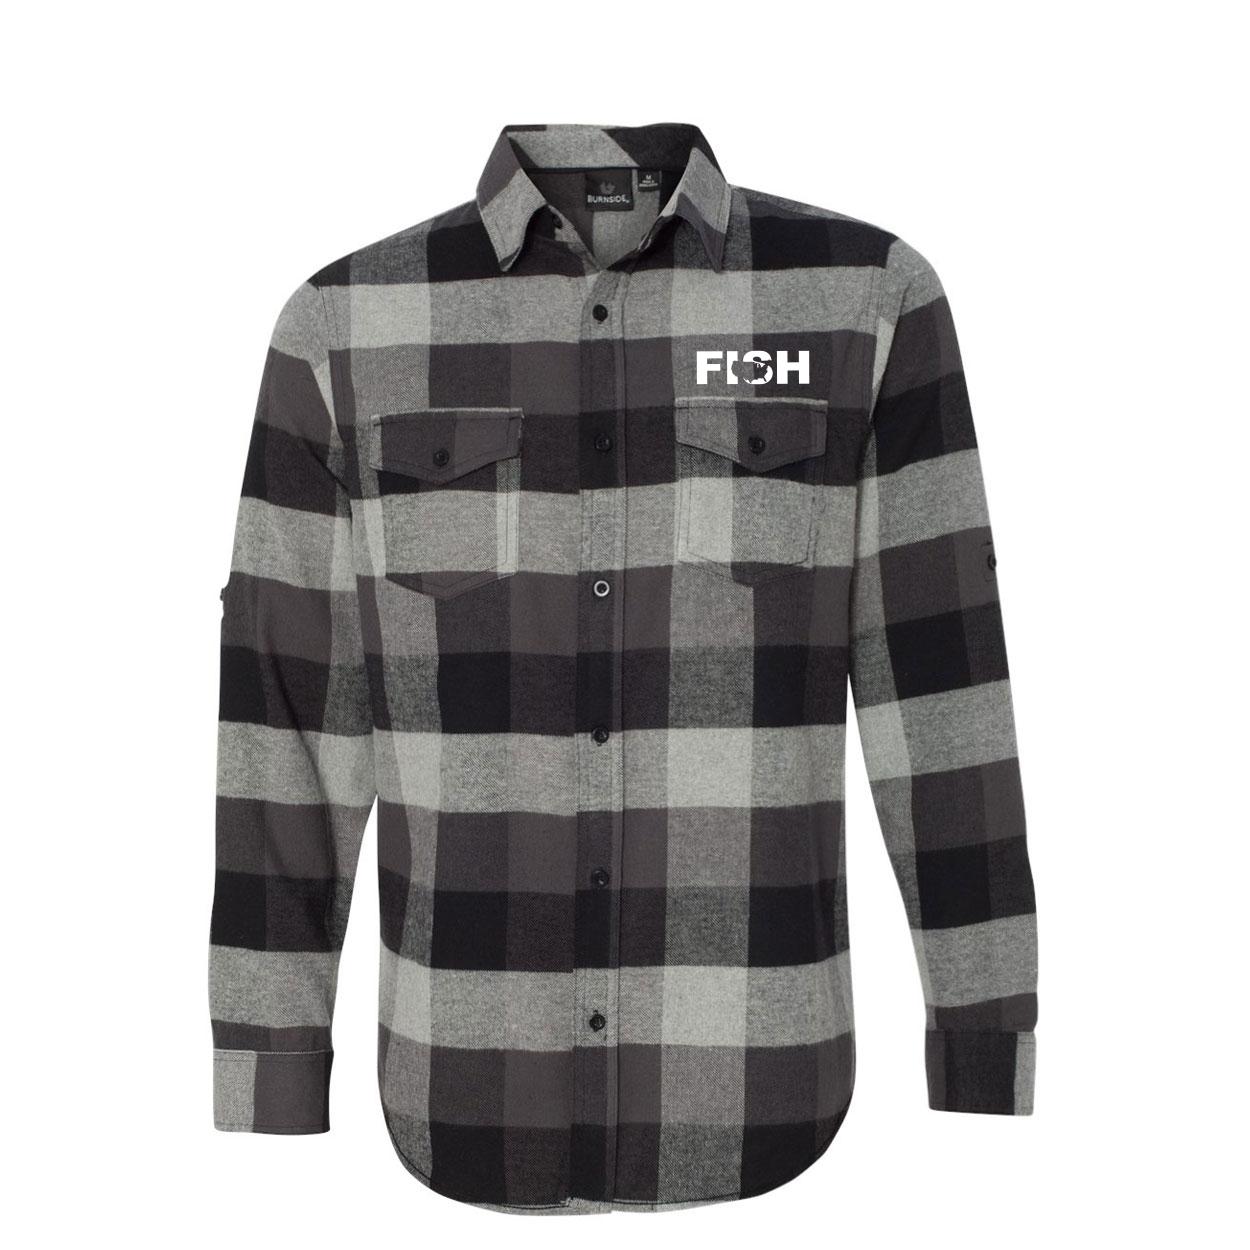 Fish United States Classic Unisex Long Sleeve Flannel Shirt Black/Gray (White Logo)